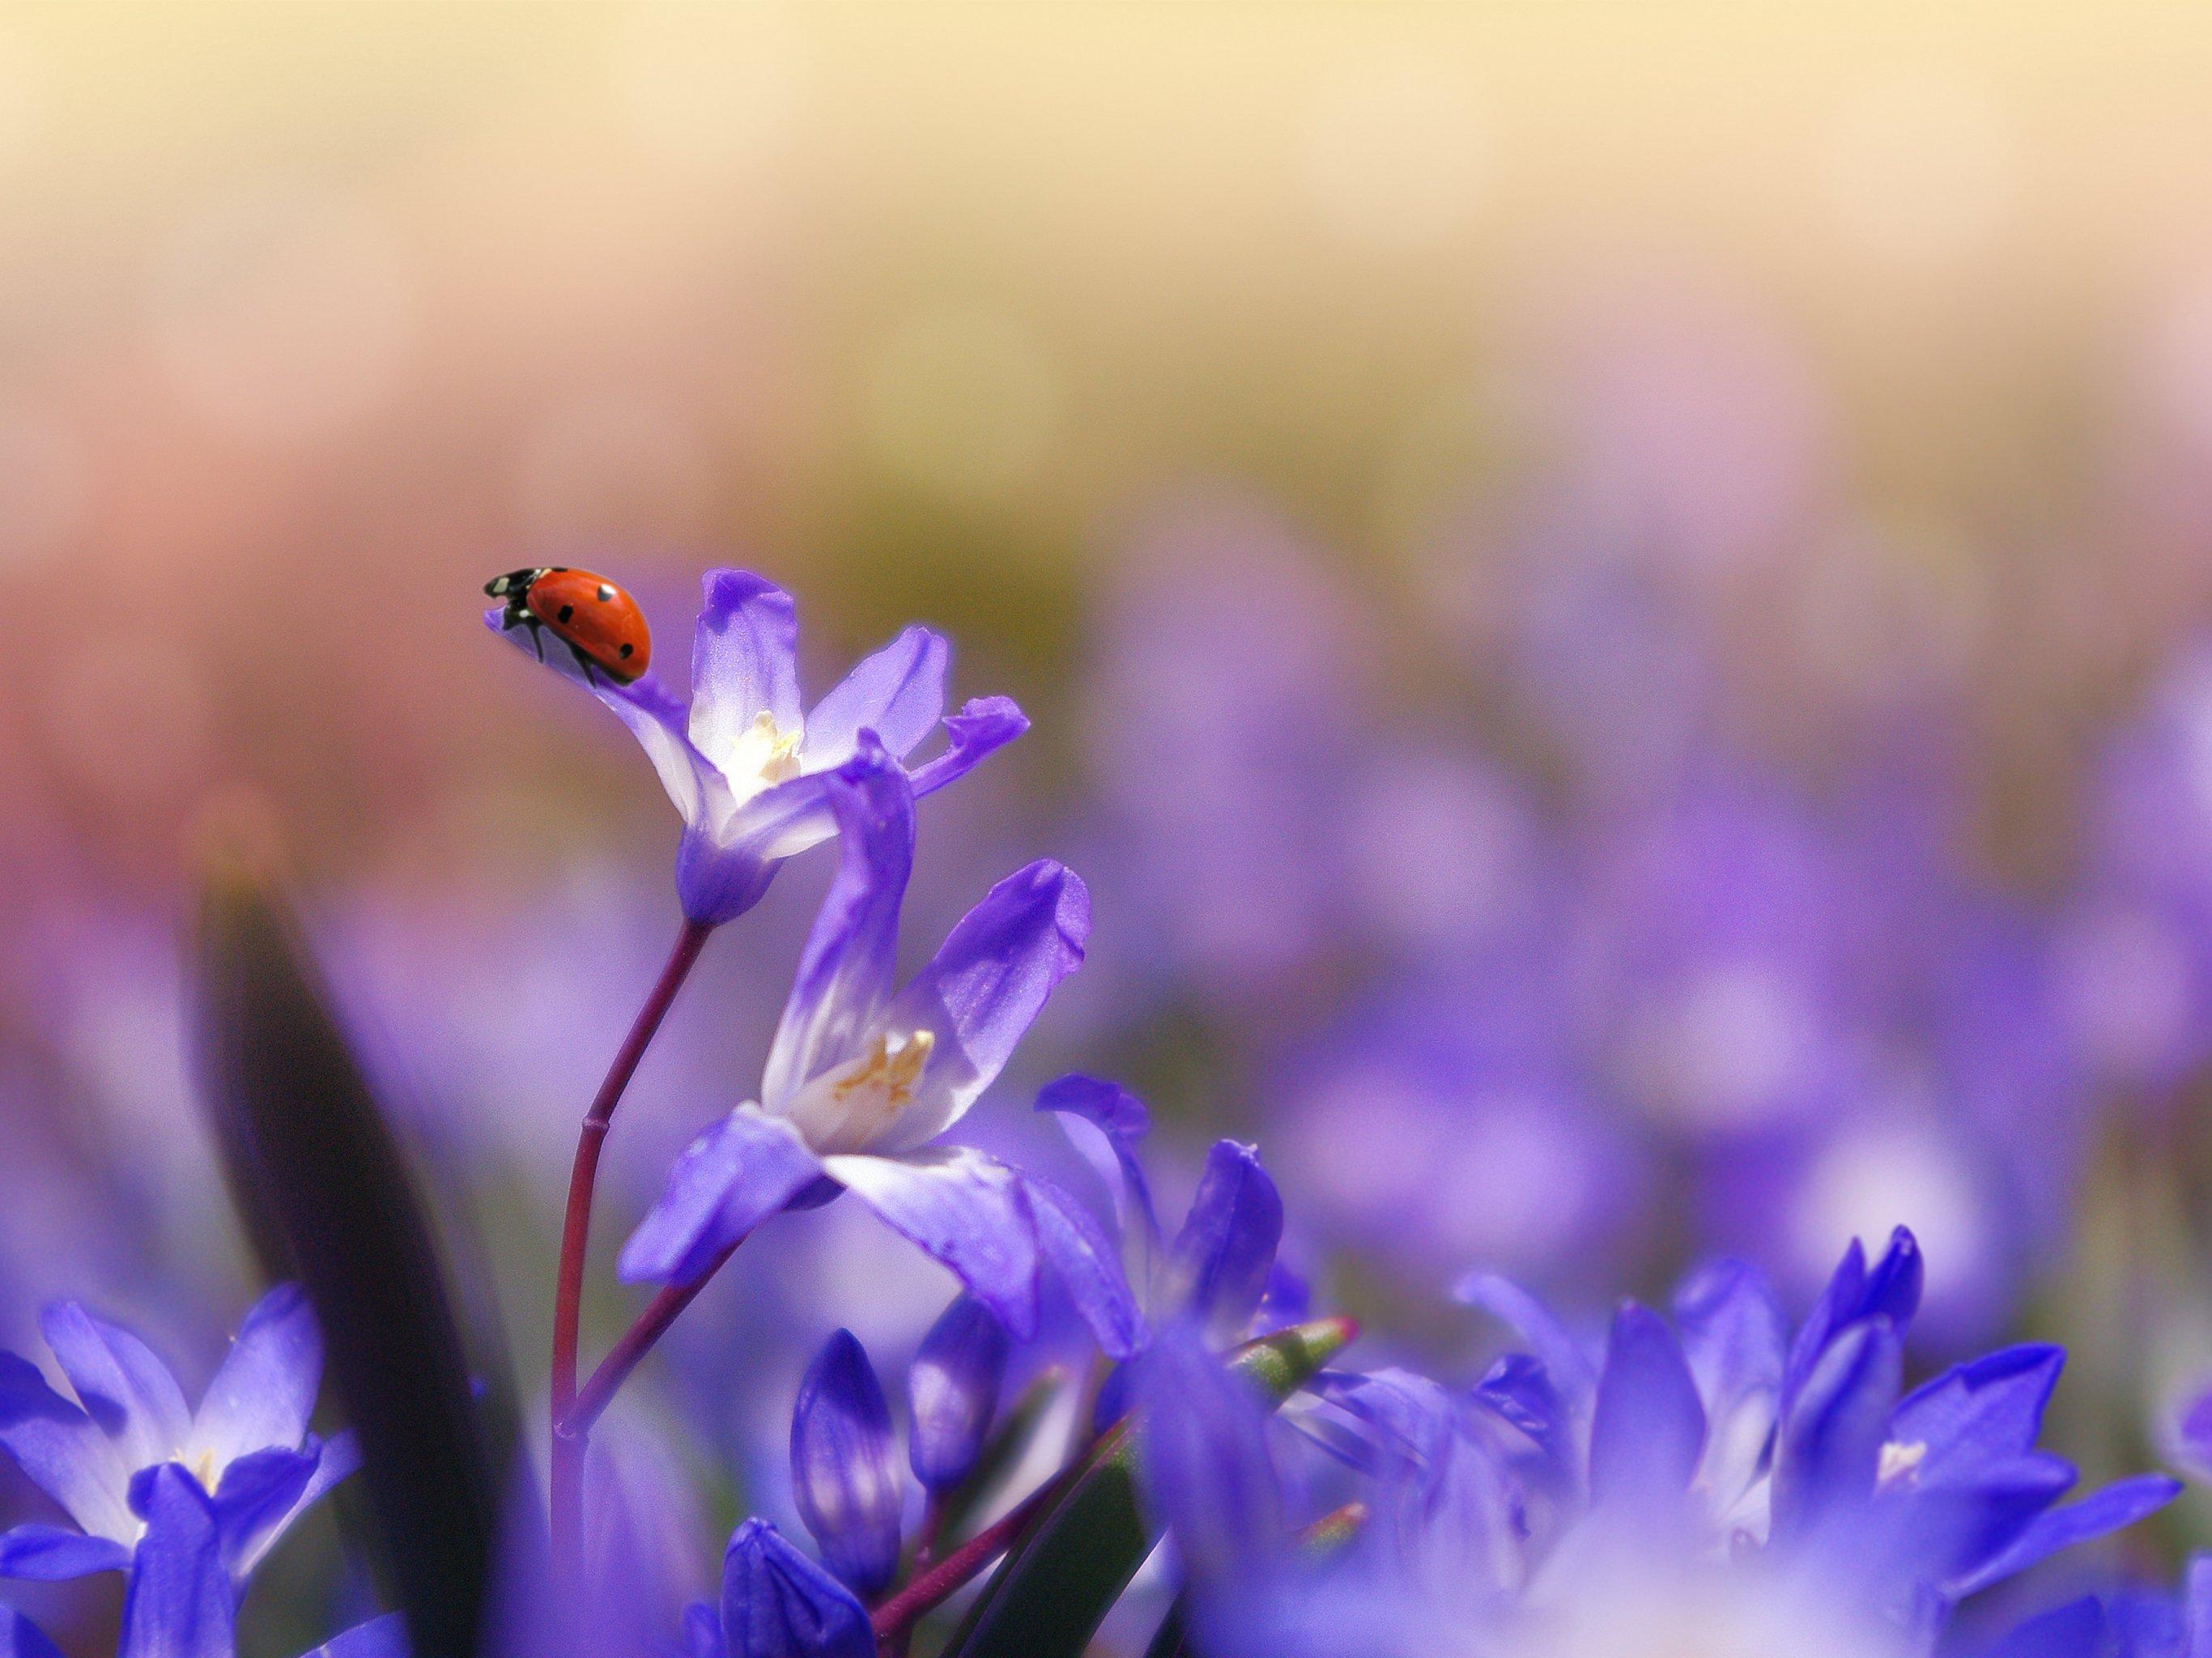 Ladybug on Purple Flower Wallpaper - Mobile & Desktop ...